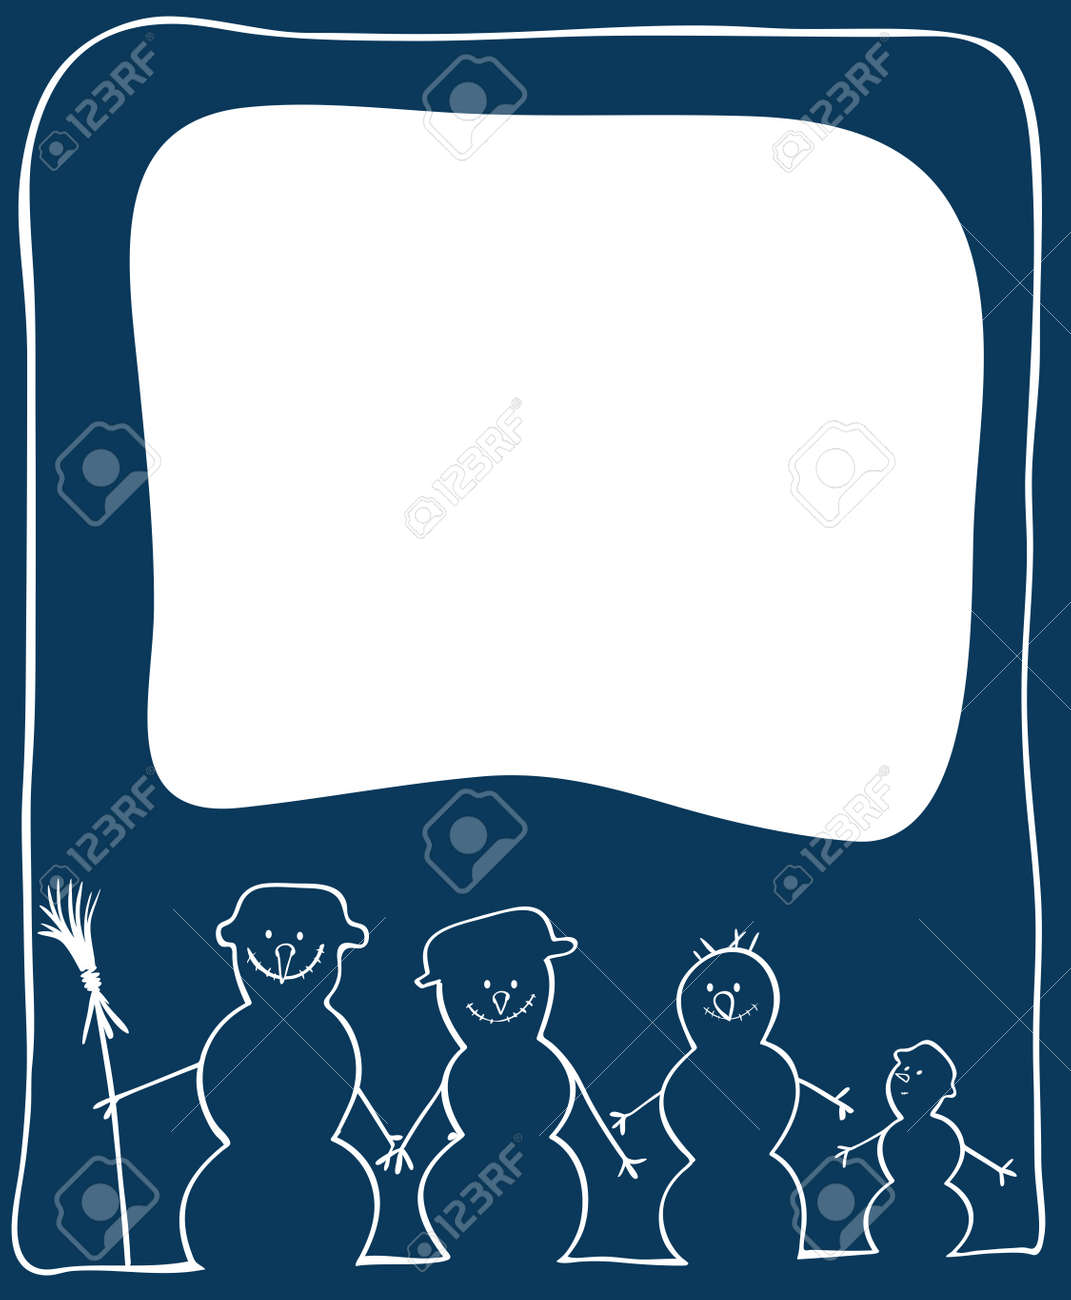 Christmas card with snowmans Stock Vector - 16953450